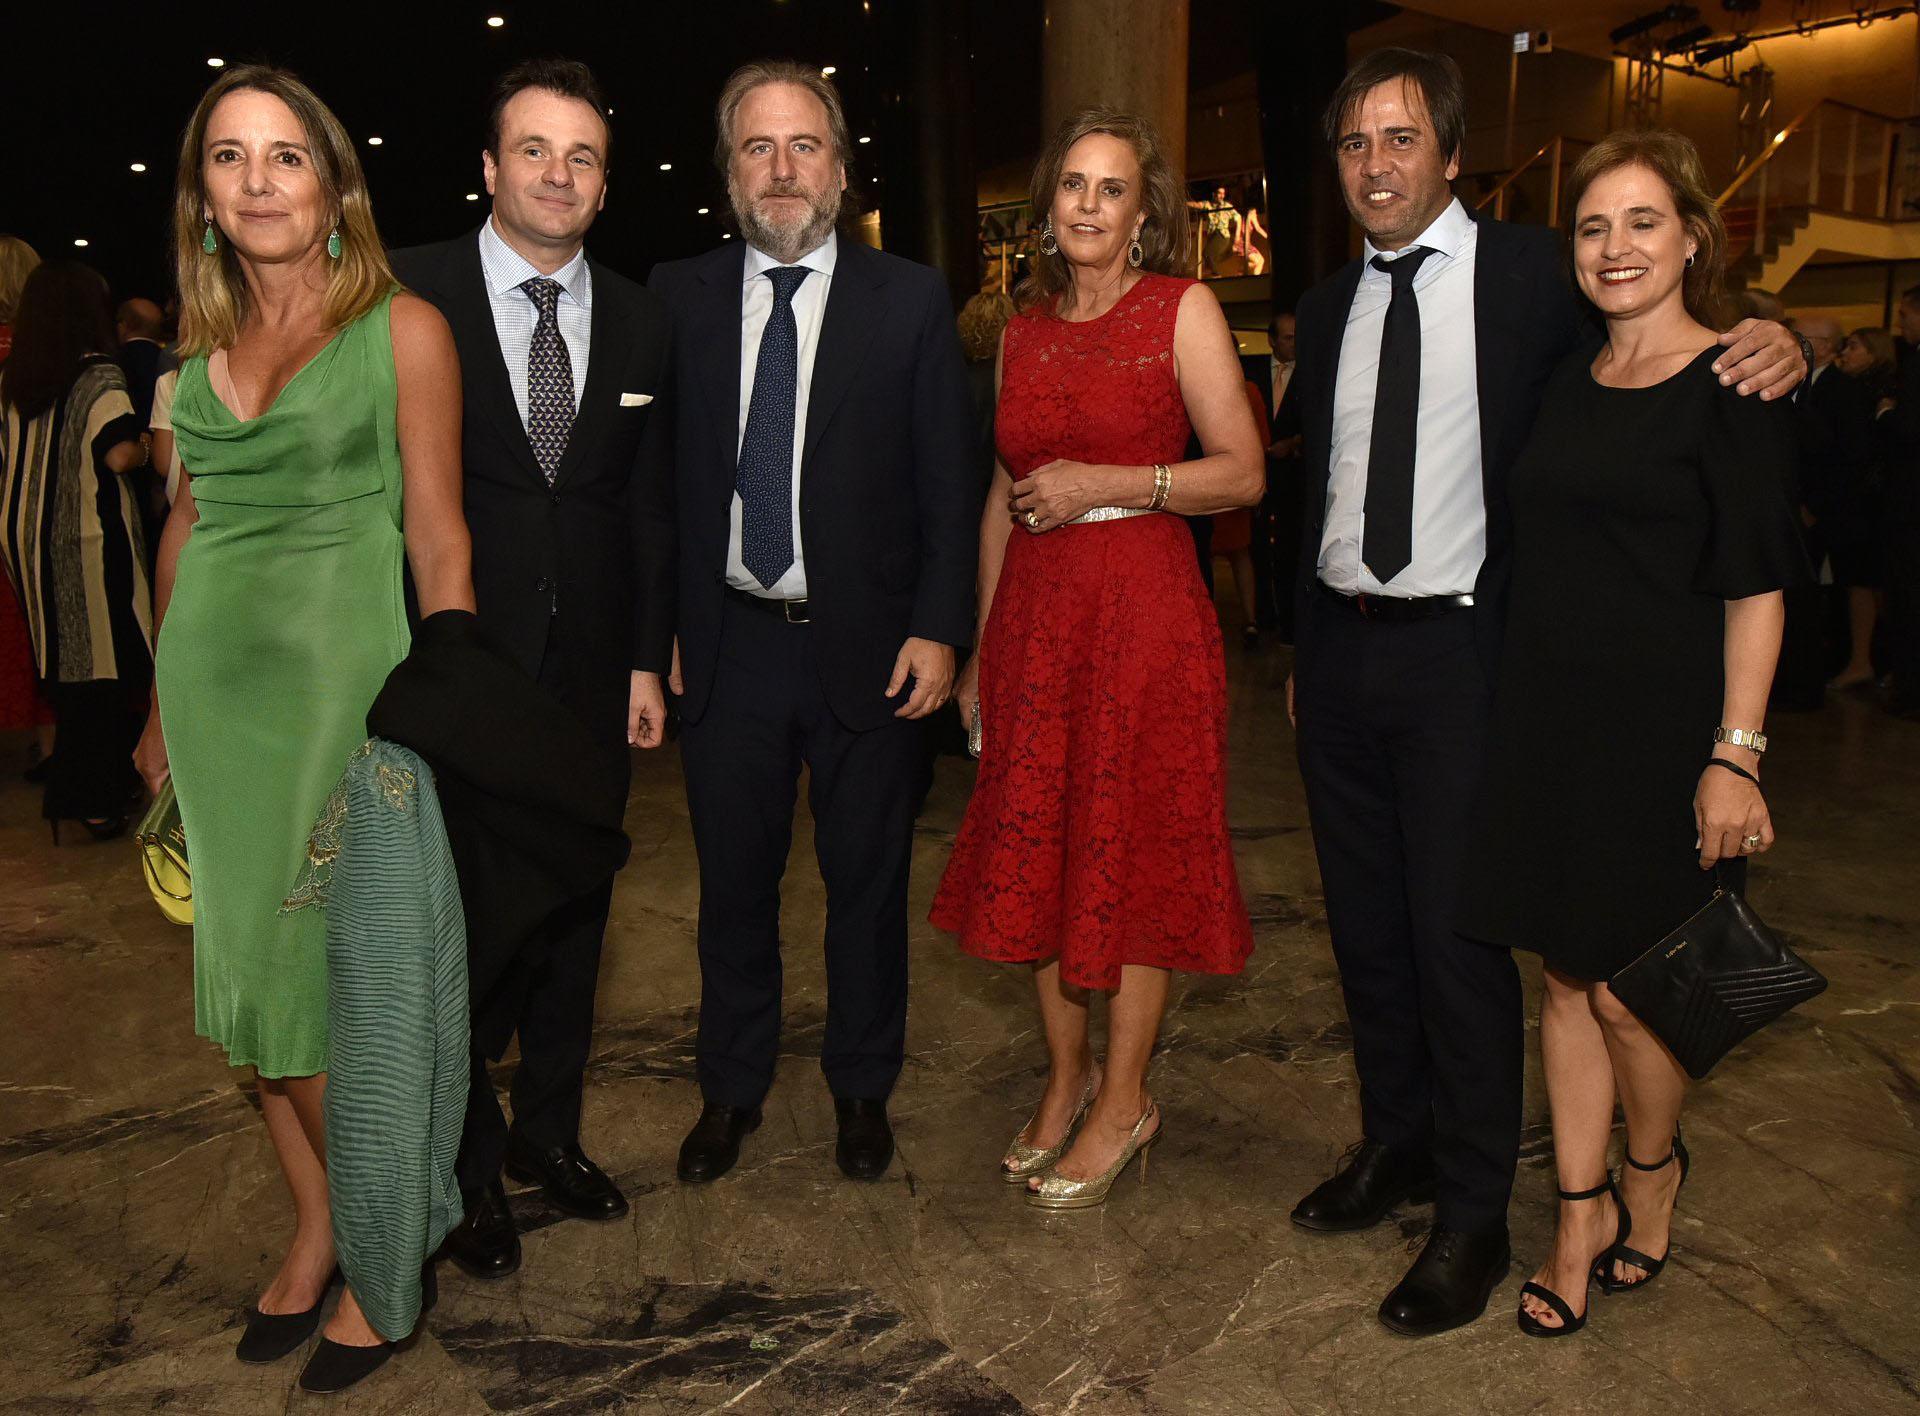 Verónica Zoani de Nutting, Juan Pablo Maglier, Tato Lanusse, Silvia Saravia de Neuss, Santiago Pando y Silvina Pueyrredon